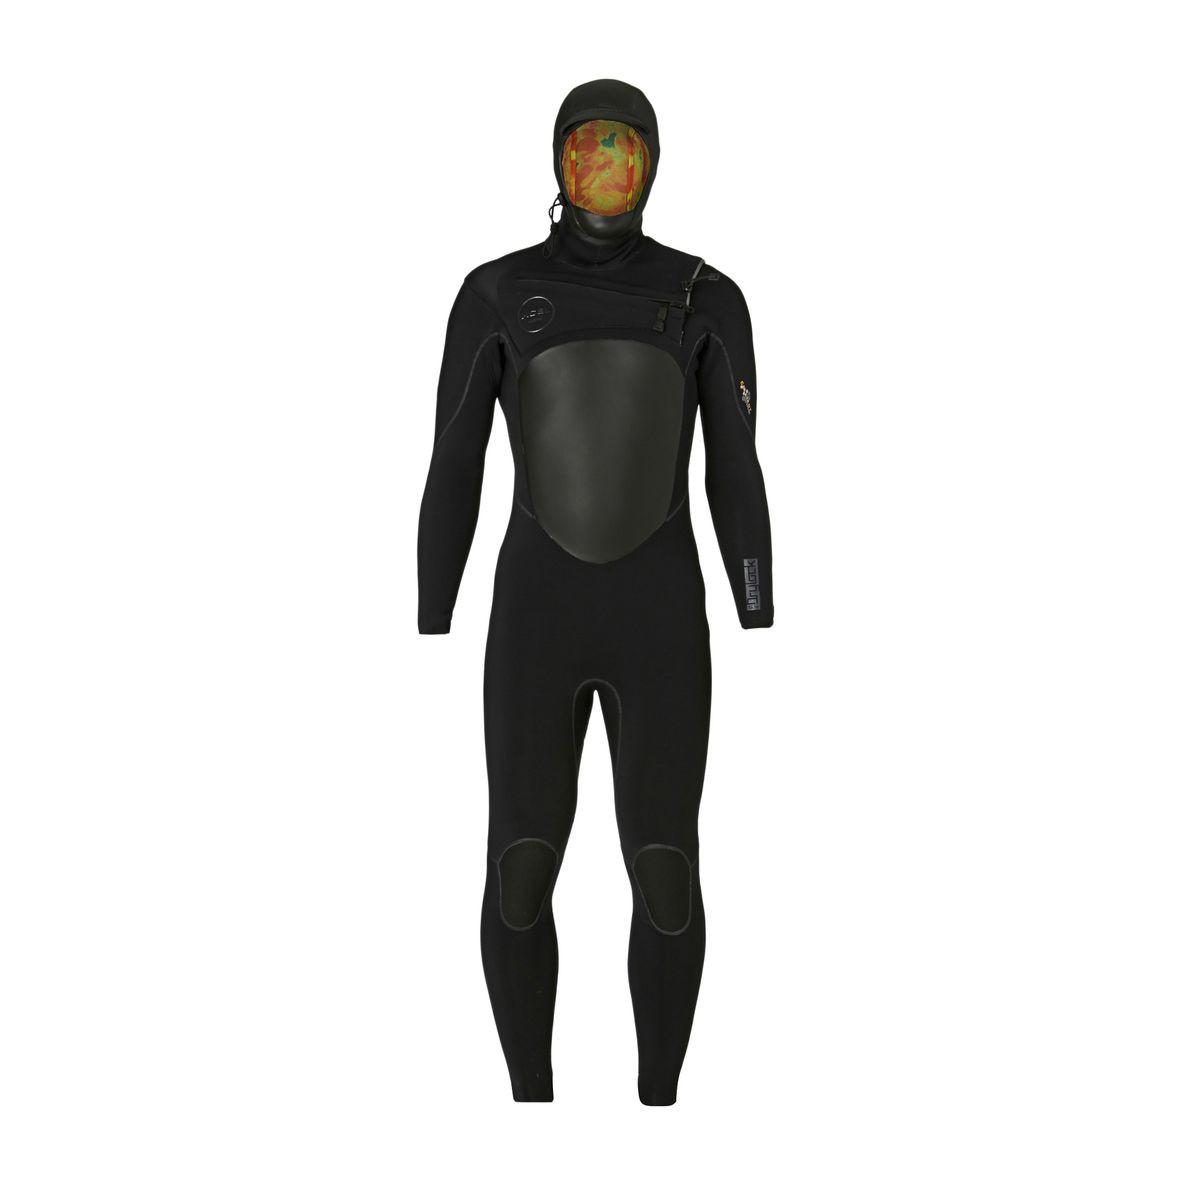 Xcel Drylock 5/4mm X2 TDC 2017 Hooded Chest Zip Wetsuit - Black